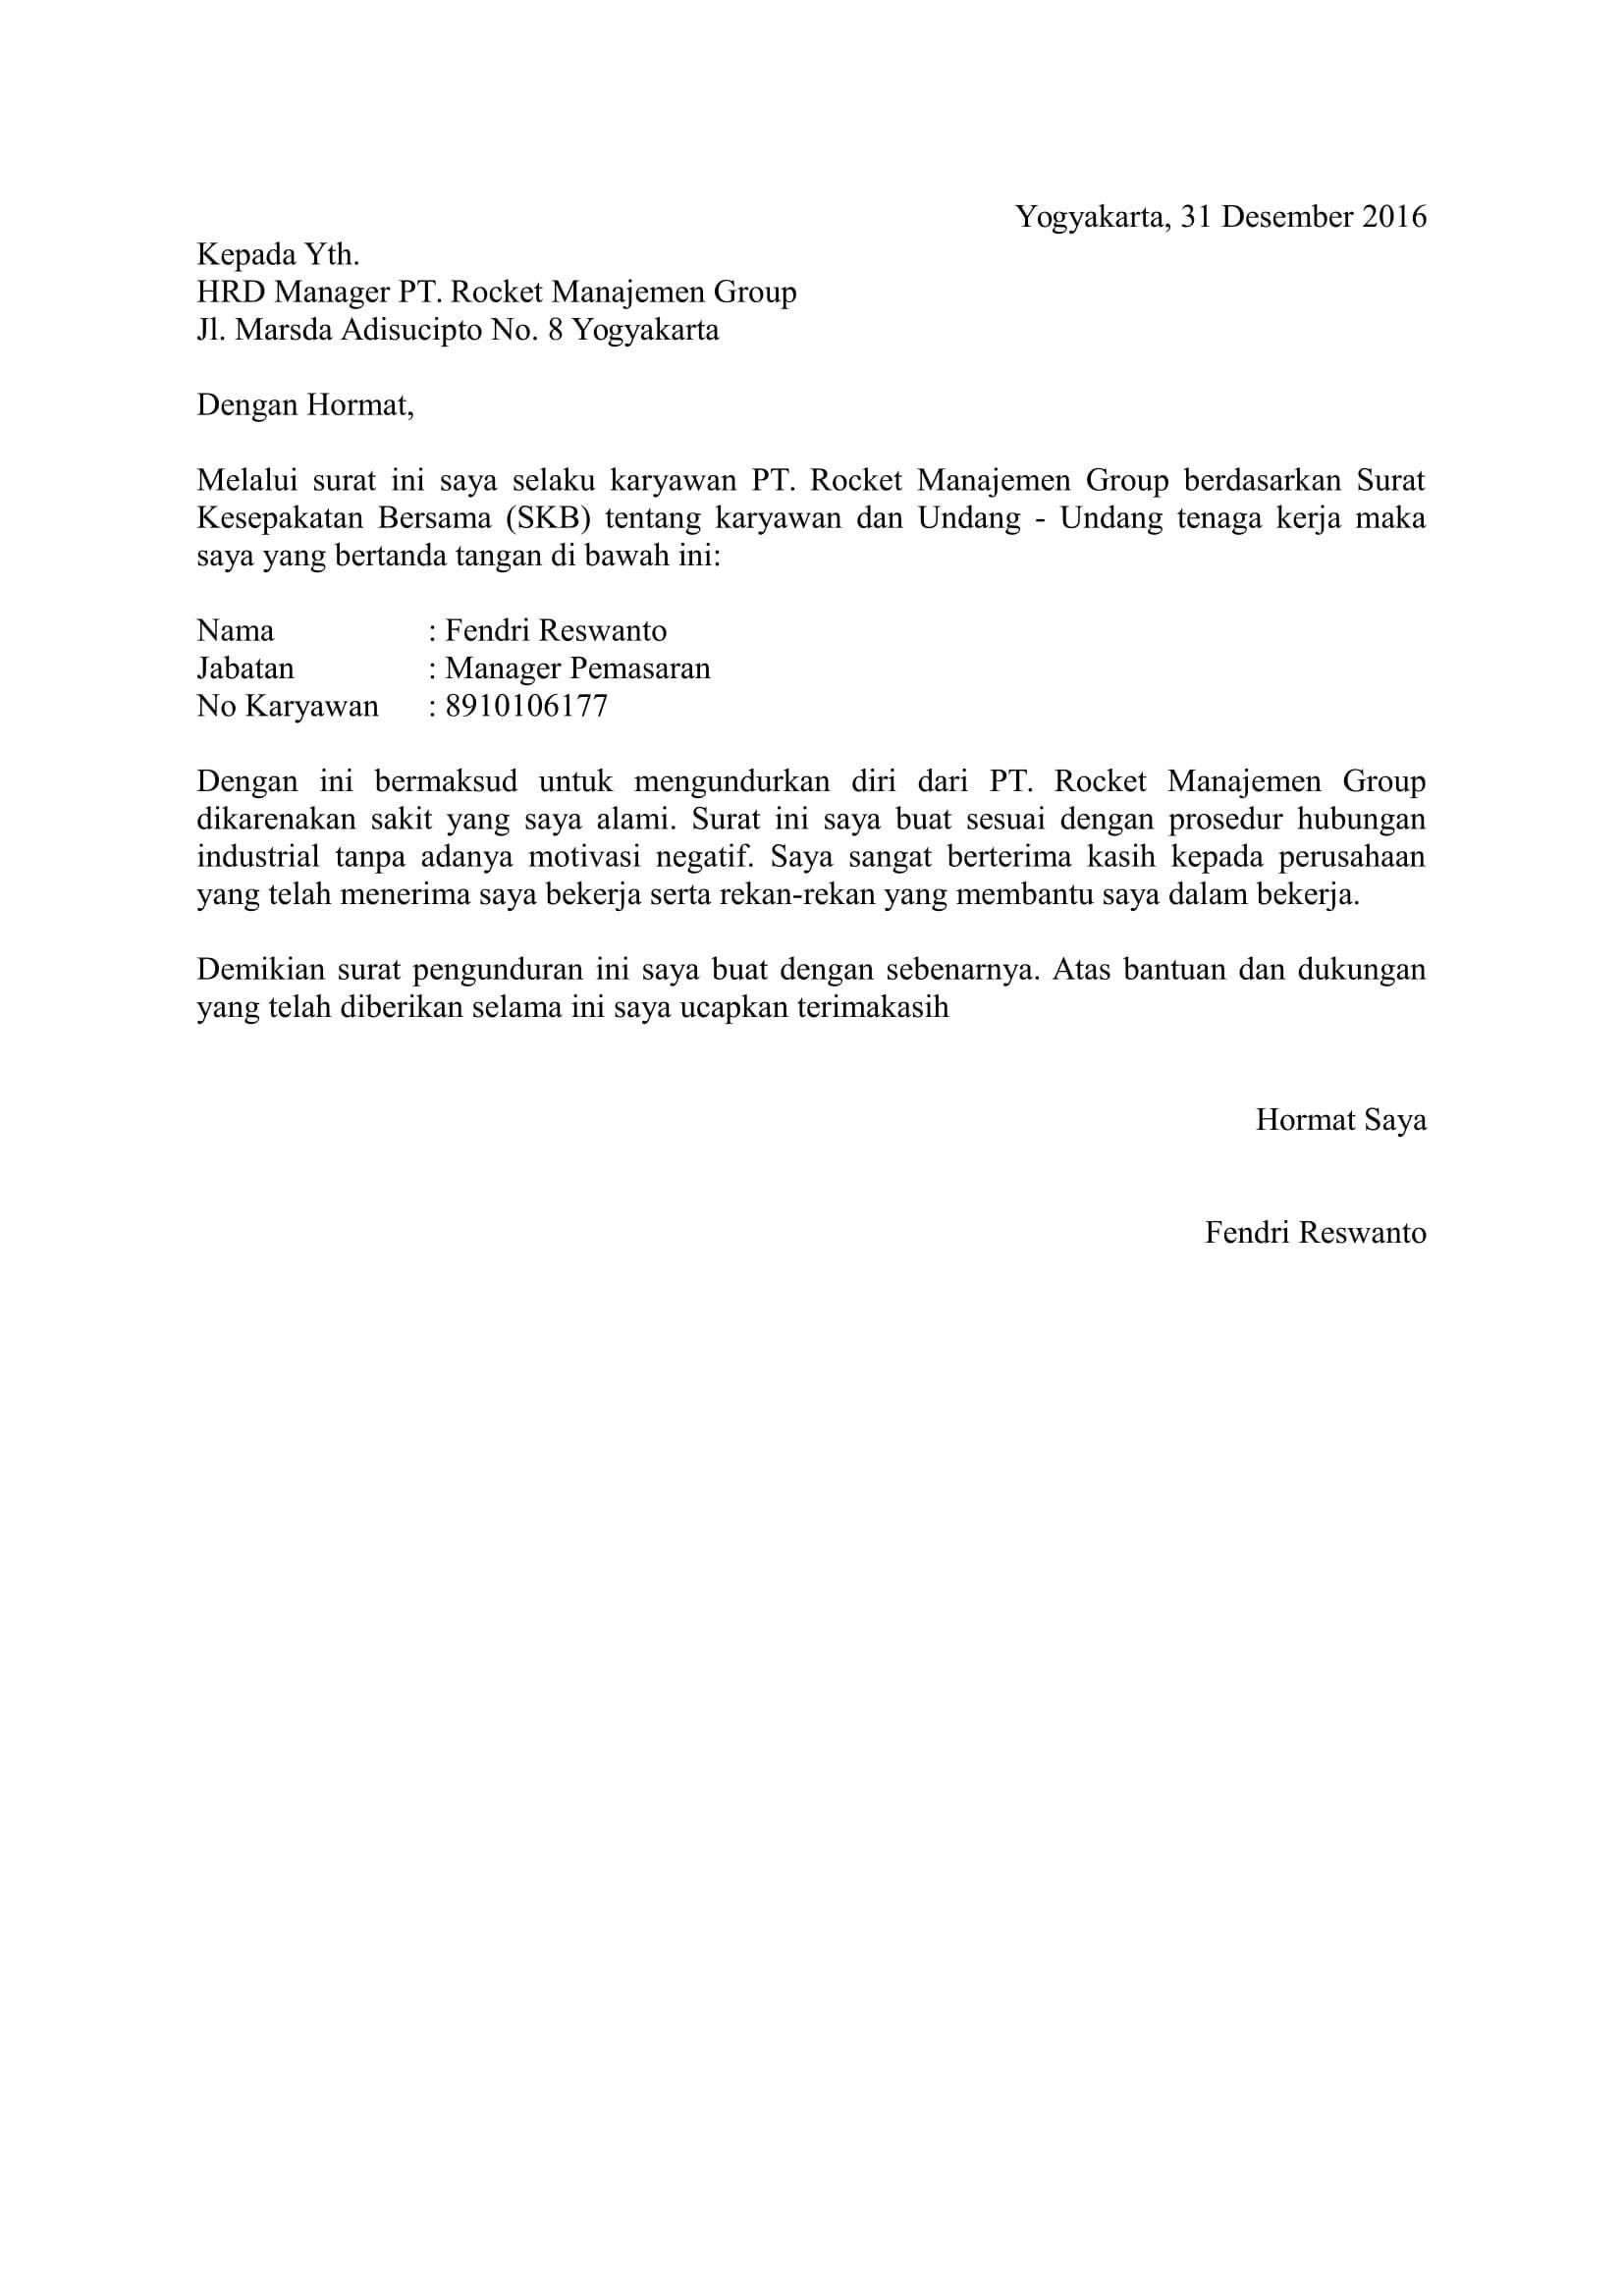 pengundurandiri Surat, Pendiri, Tanda